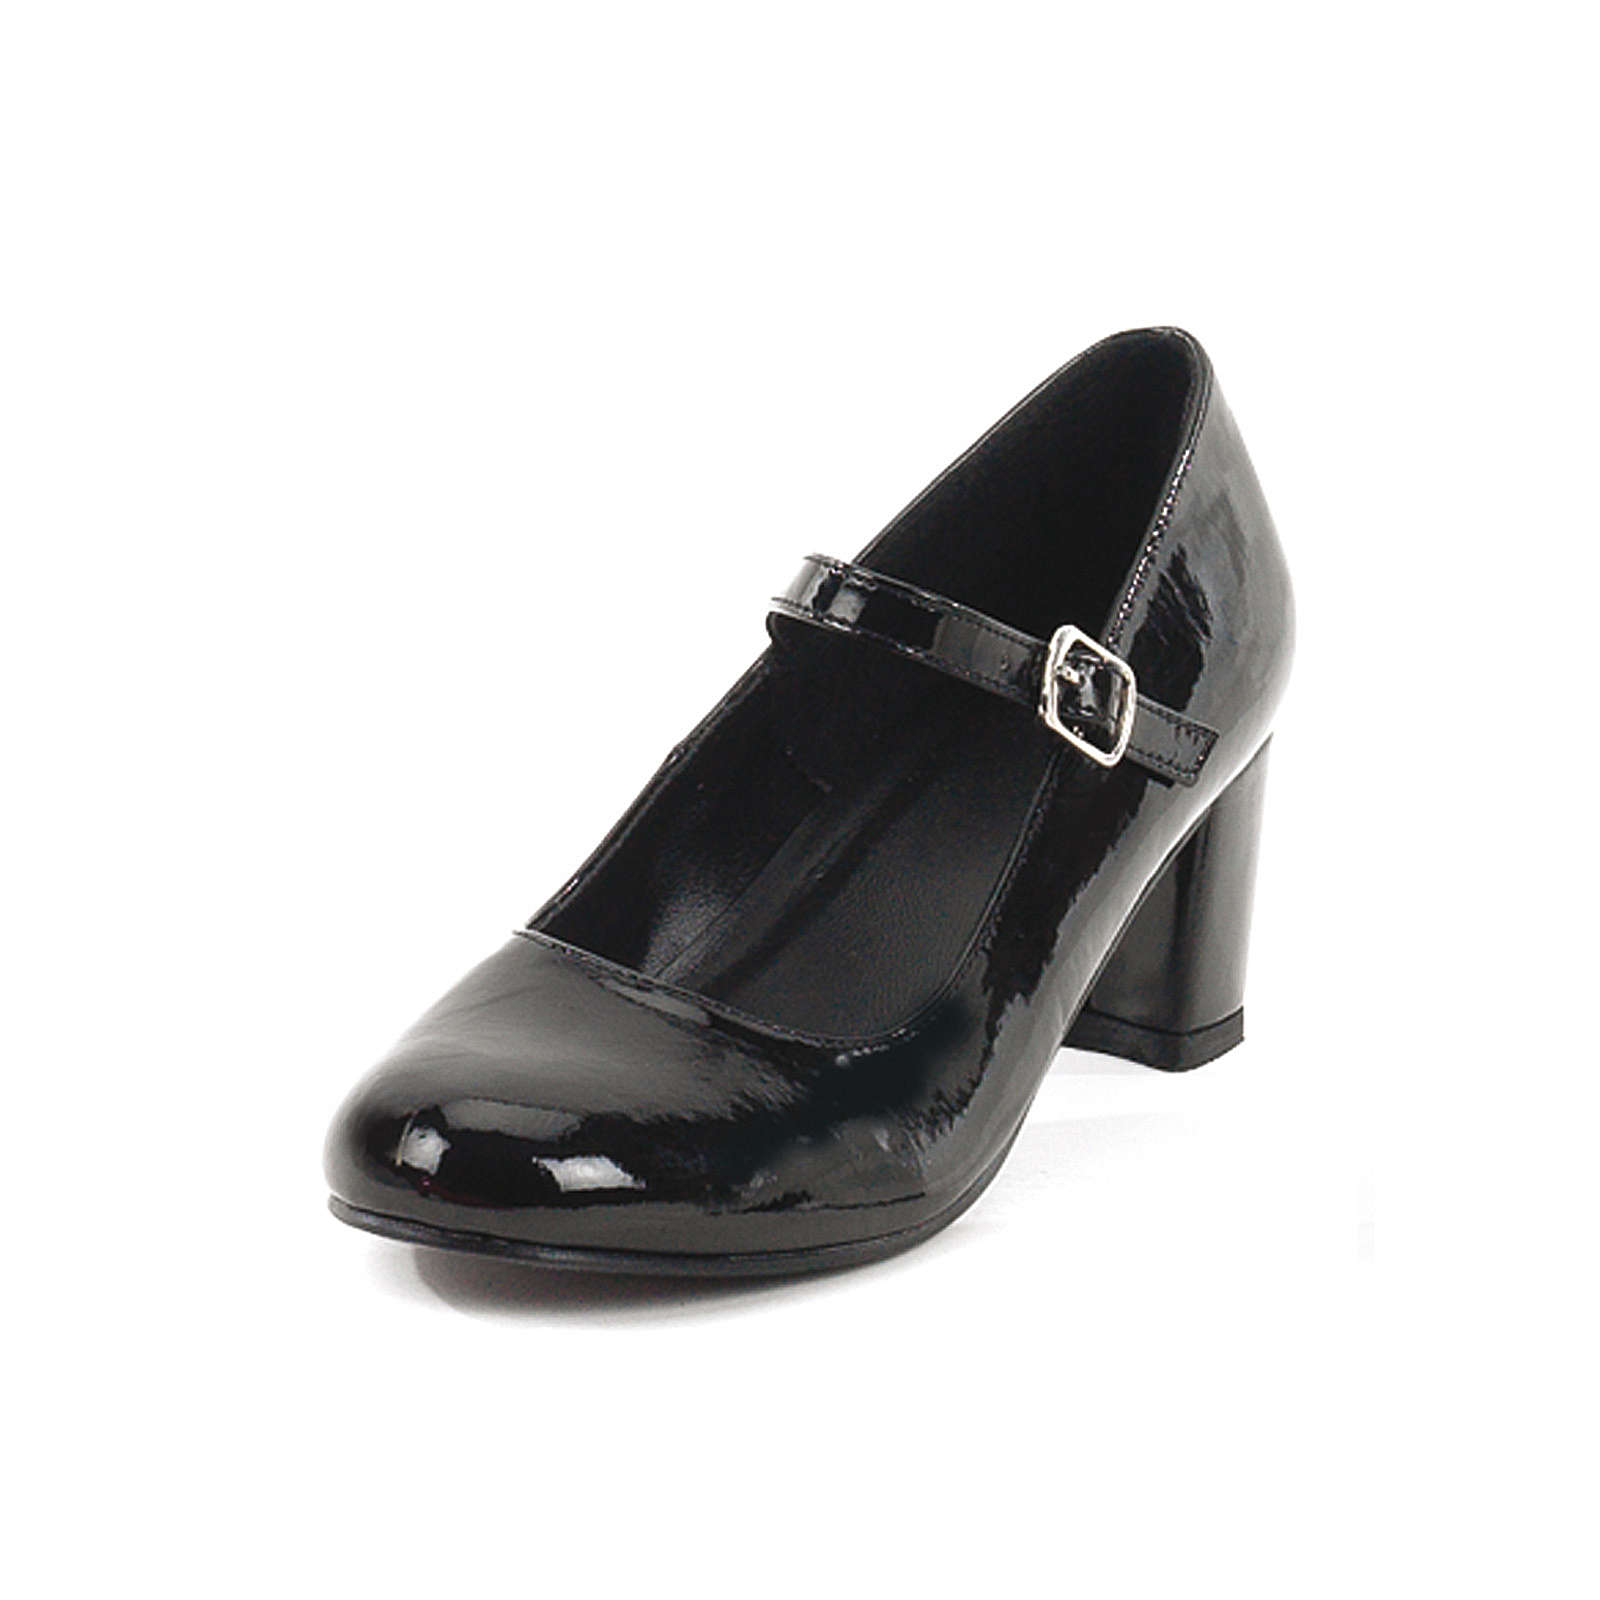 FUNTASMA® Kostümschuhe Schuluniform Schoolgirl Klassische Halbschuhe schwarz Modell 1 Damen Gr. 36